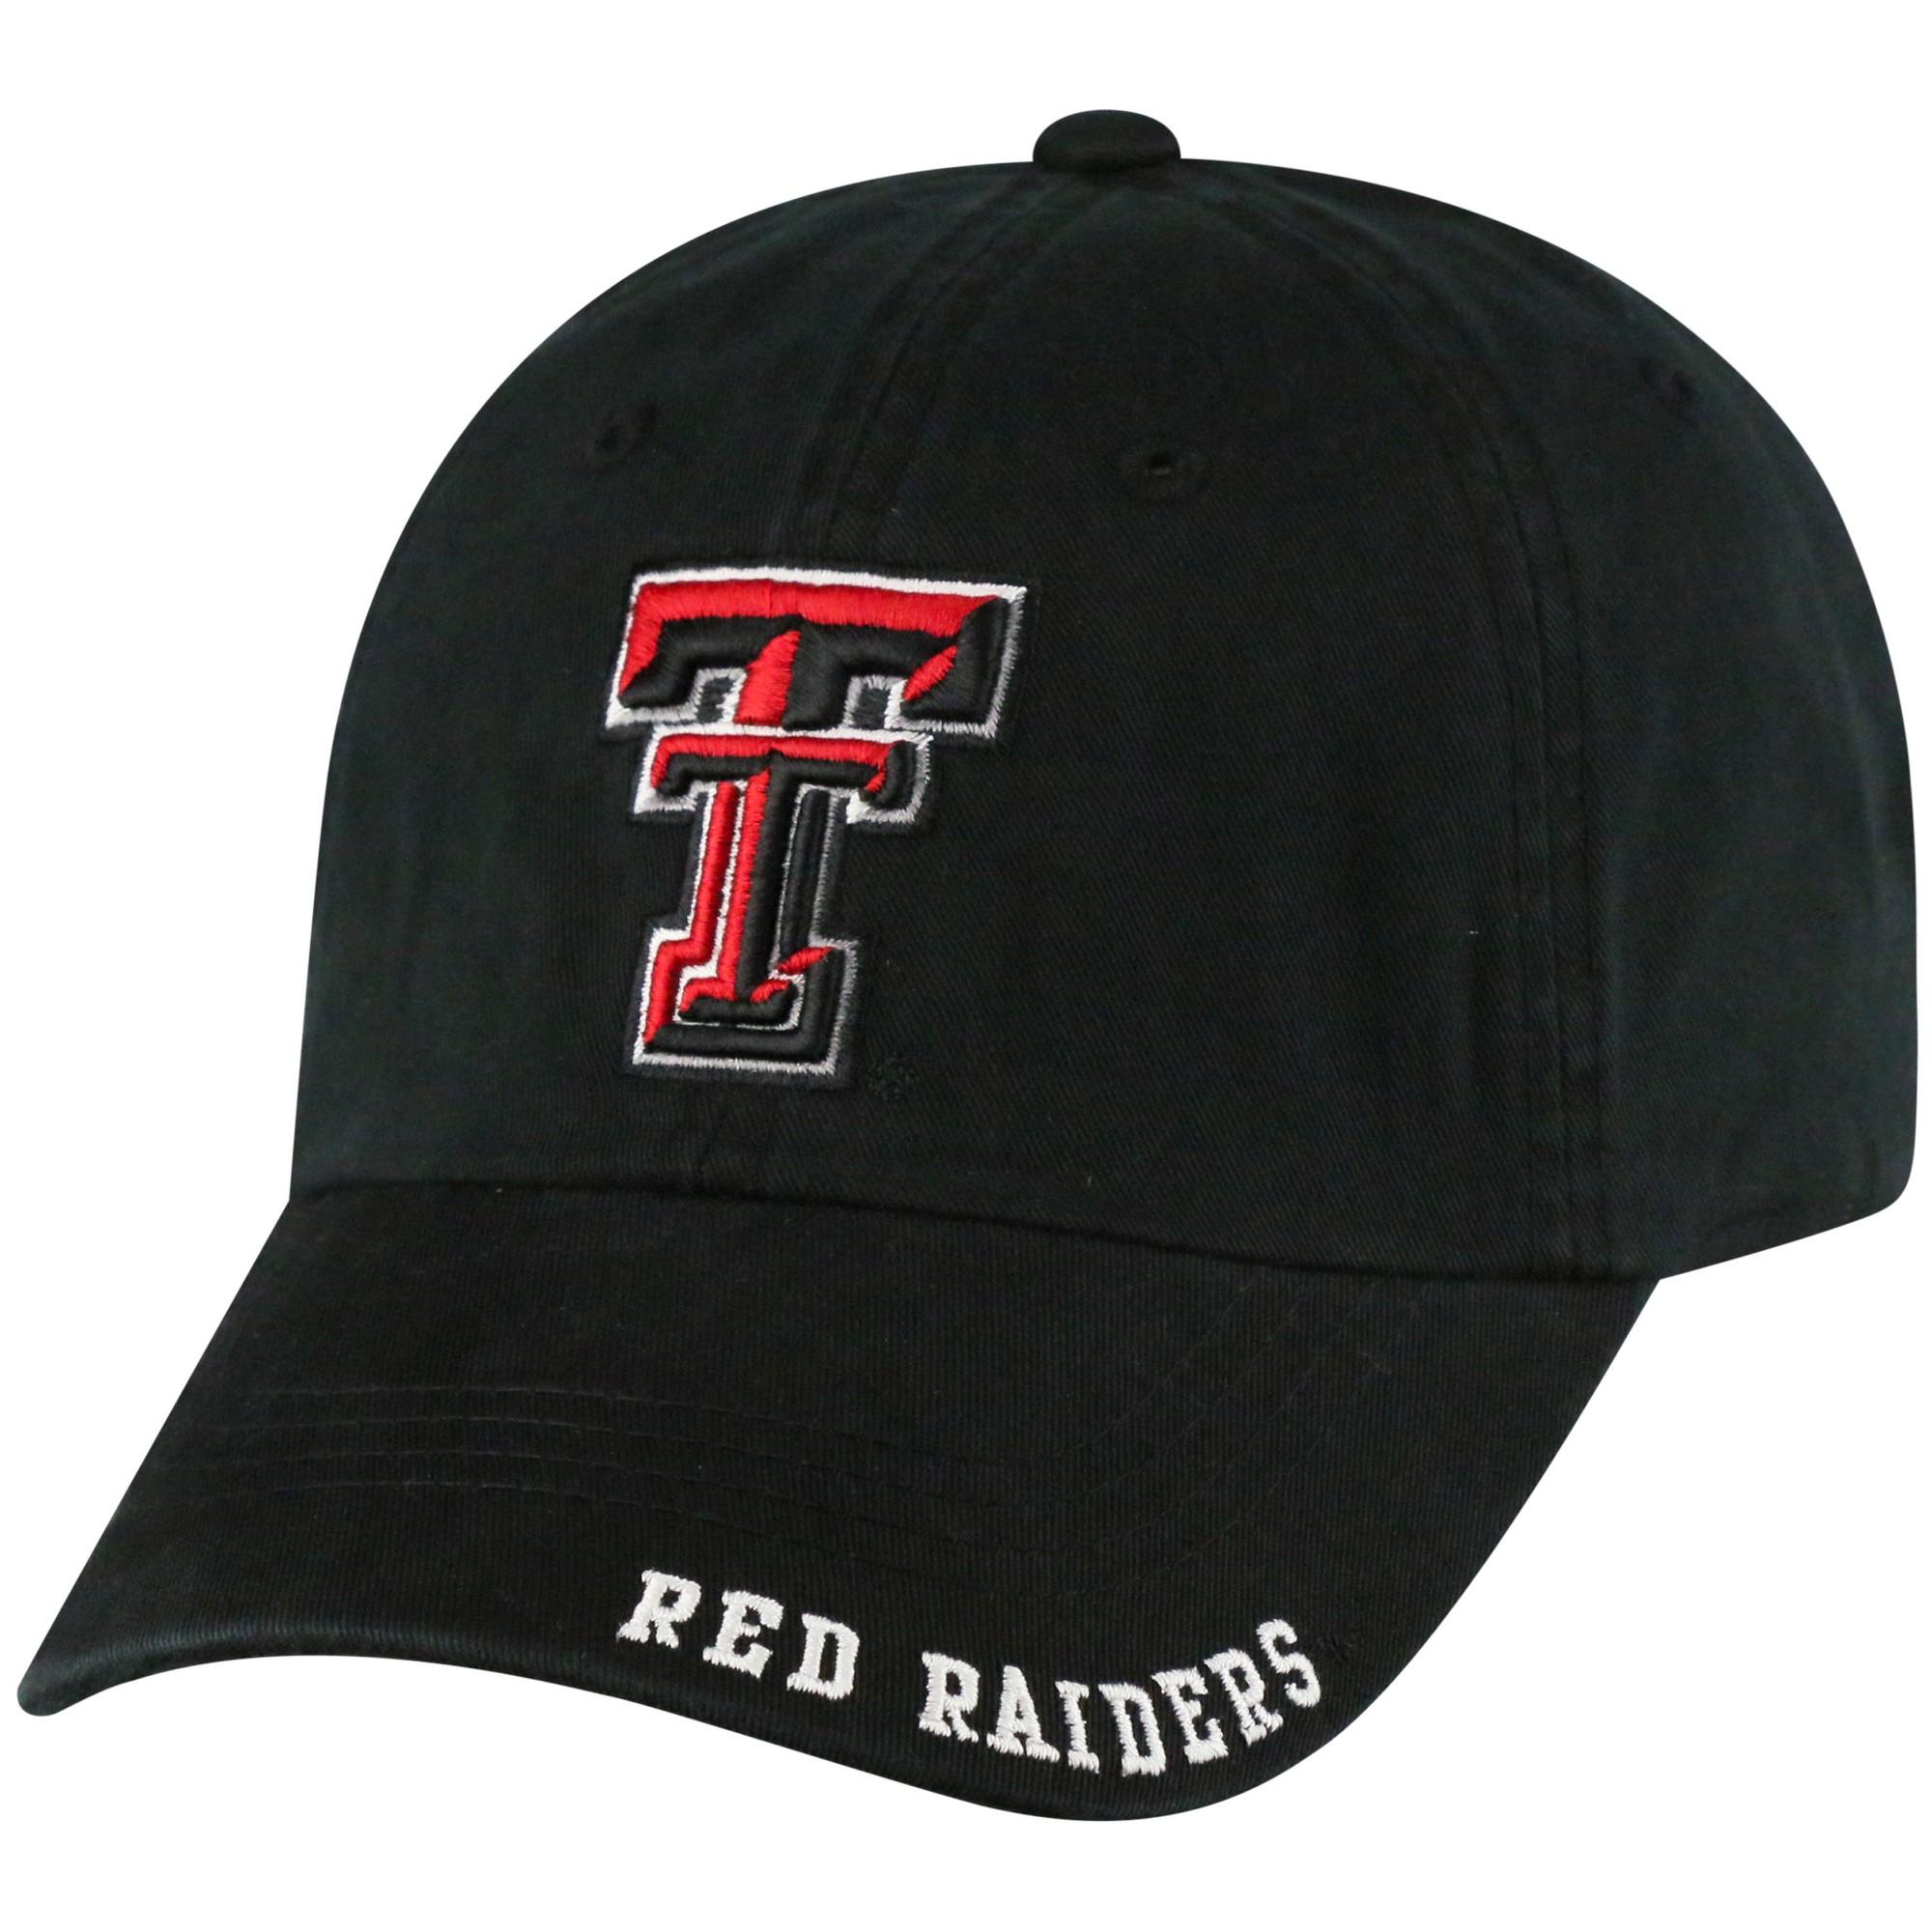 8a53e40f5cc NCAA Texas Tech Red Raiders Captain Adjustable Atc Baseball Hat ...